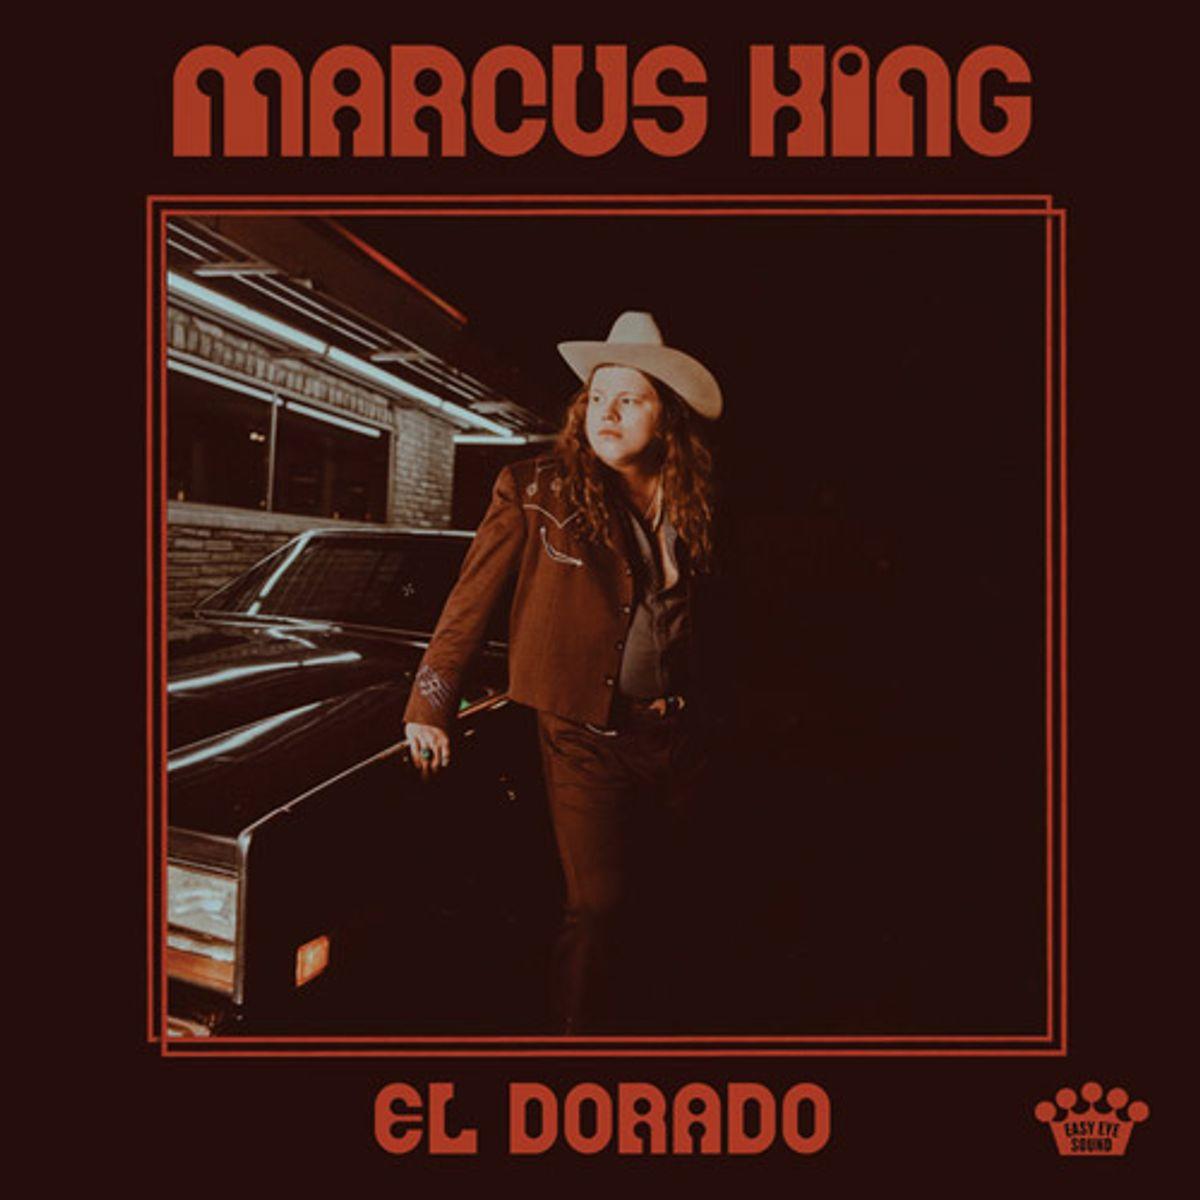 Marcus King Announces 'El Dorado' Album and Releases New Track